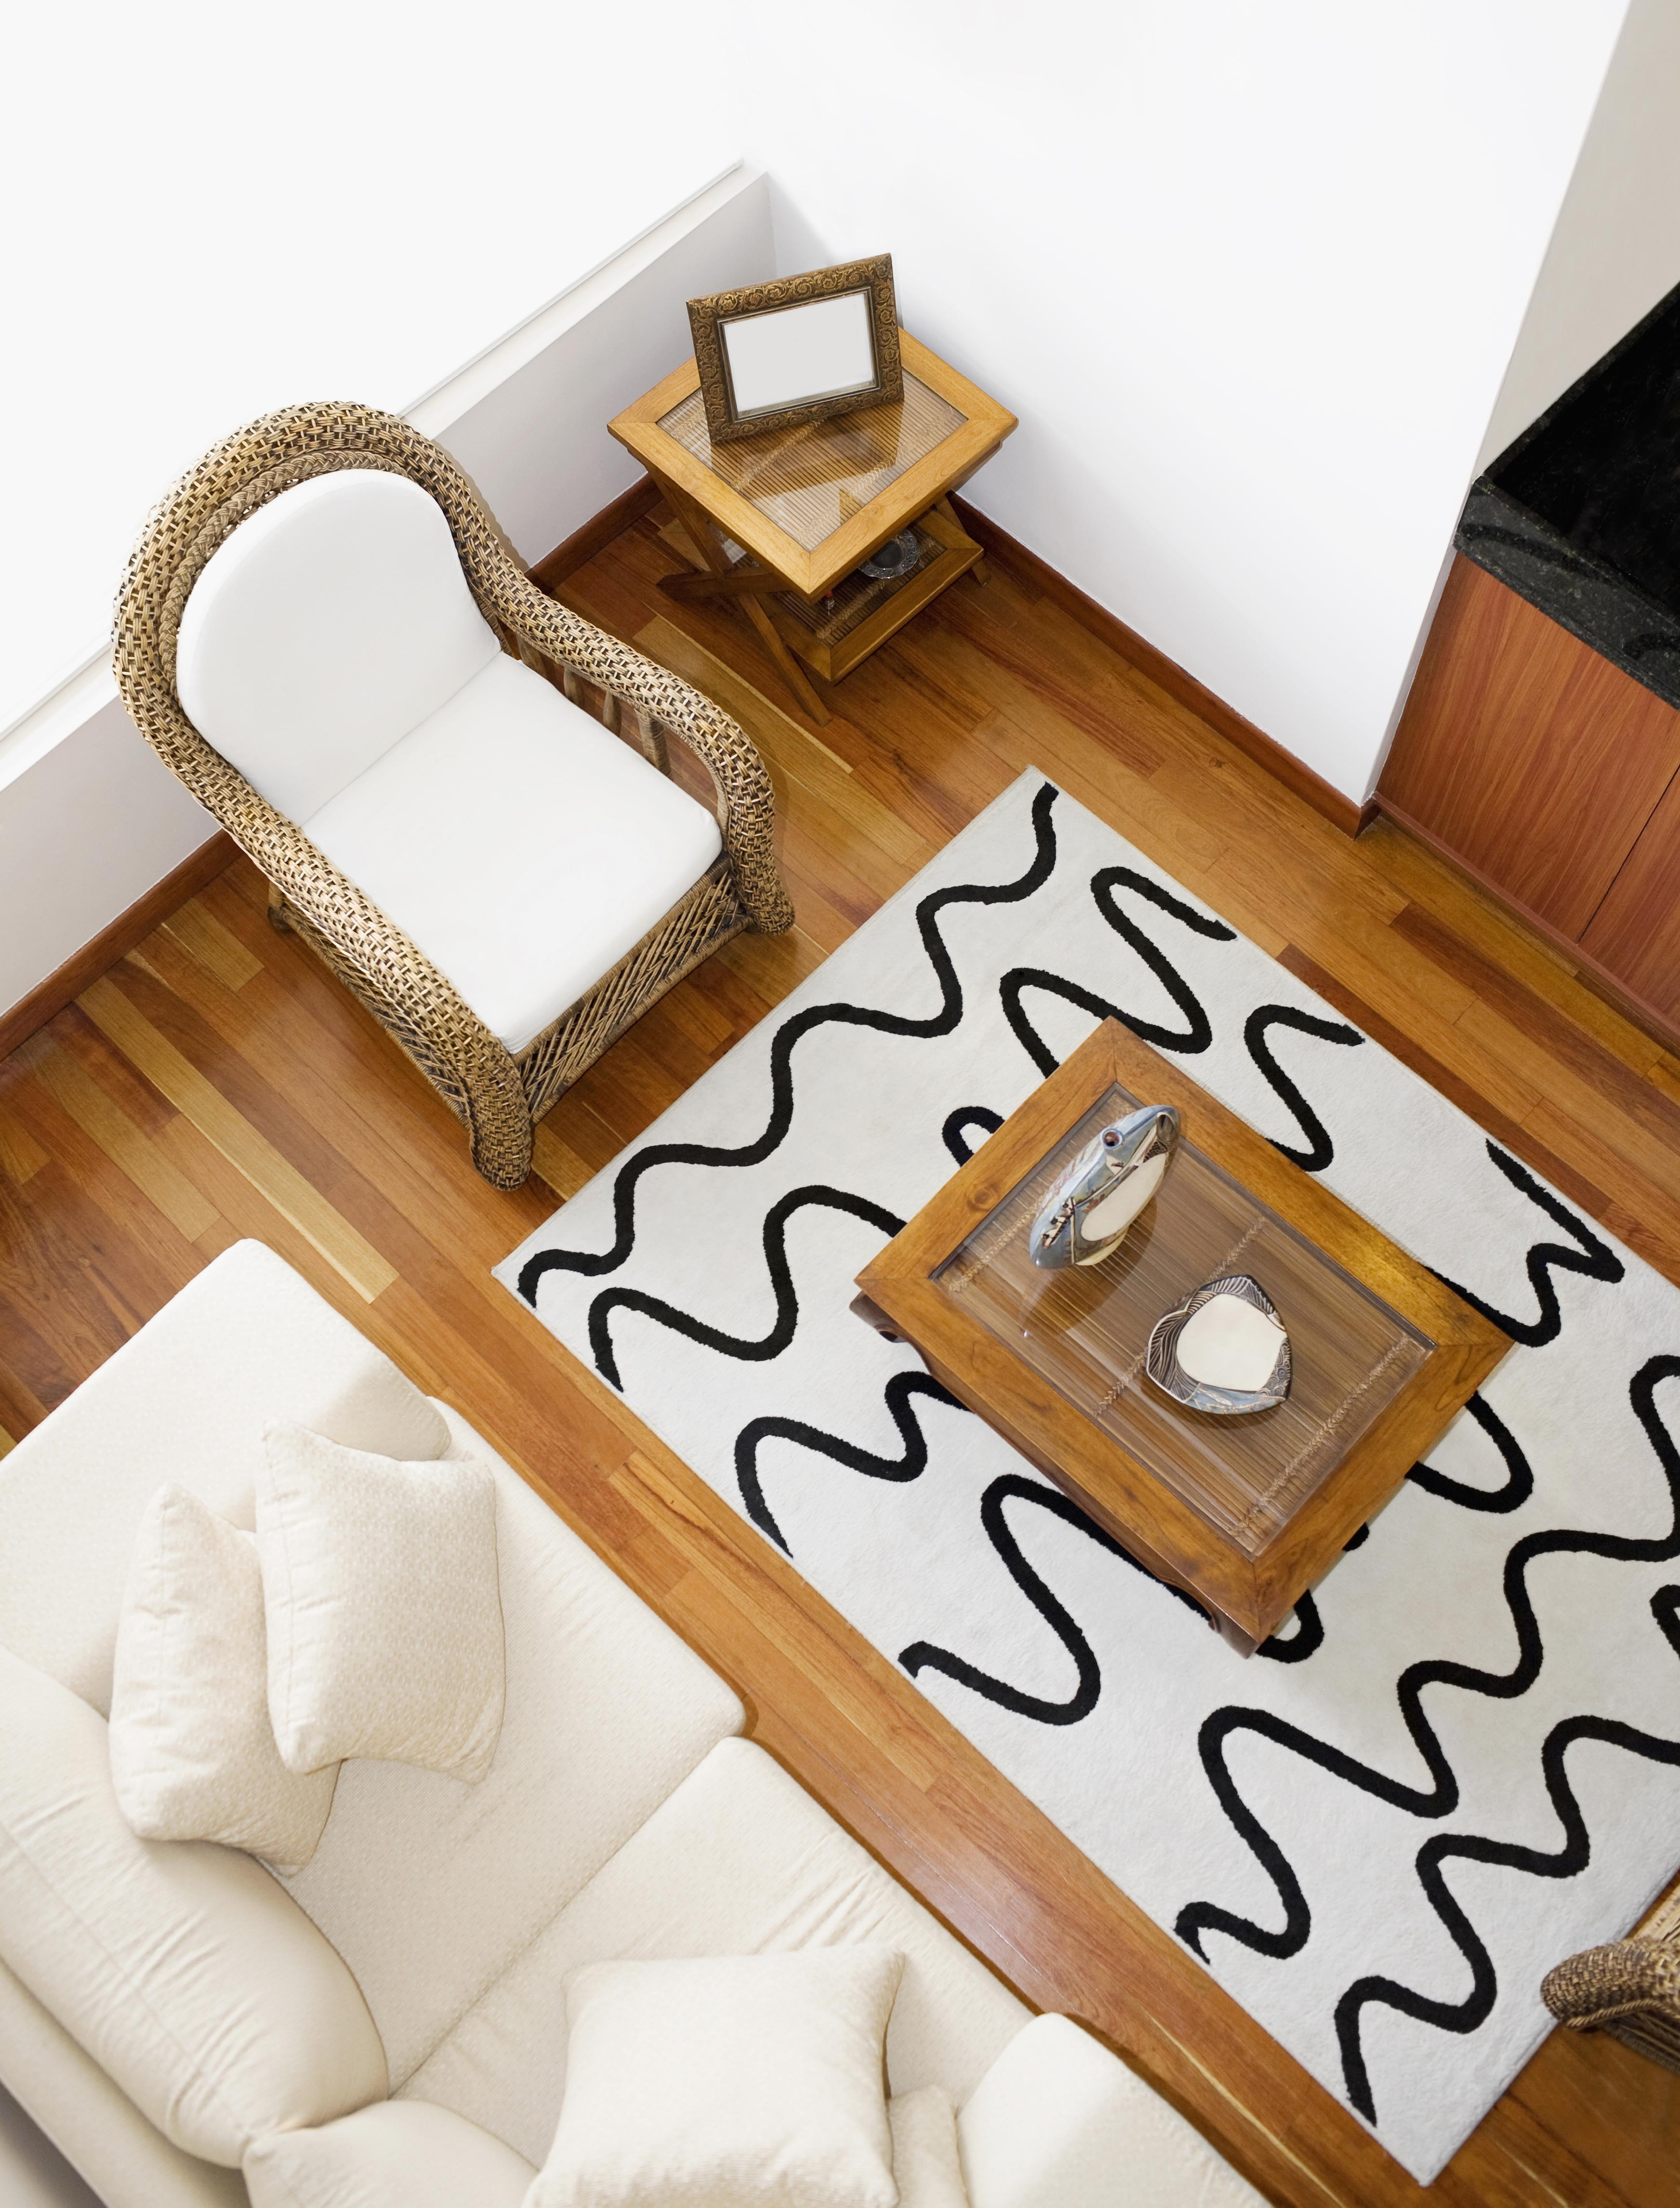 Cosa notano gli arredatori d 39 interni in una casa for Arredatore d interni online gratis